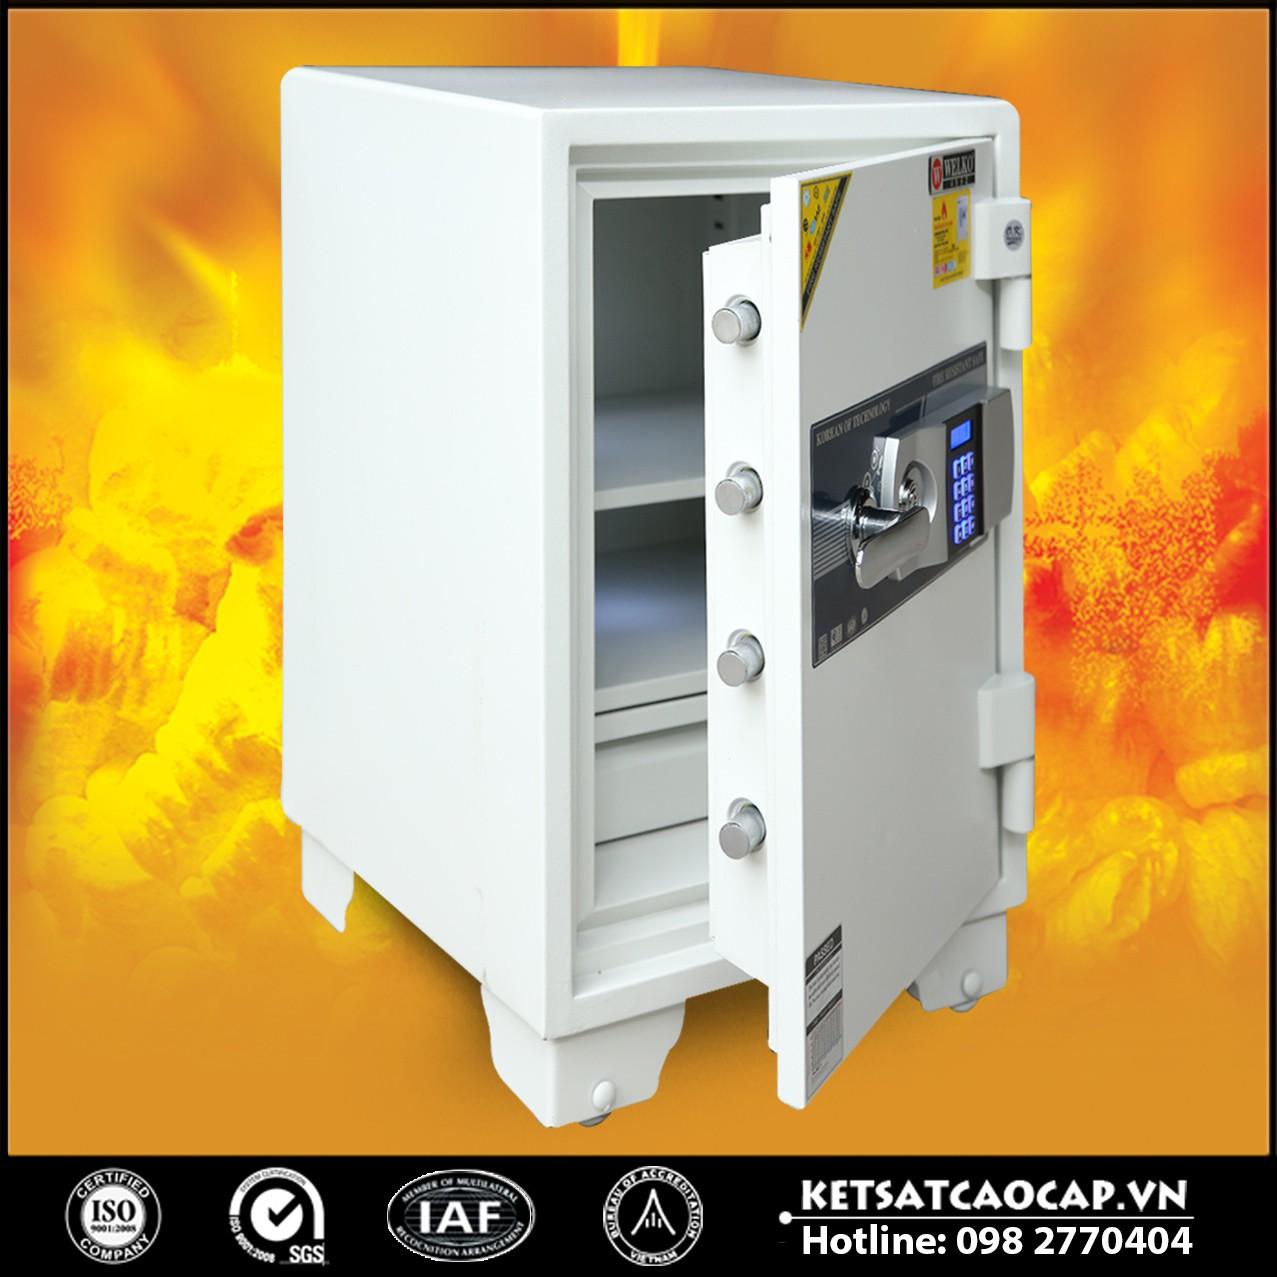 Két Sắt Giá Rẻ LX630 E Silver - White